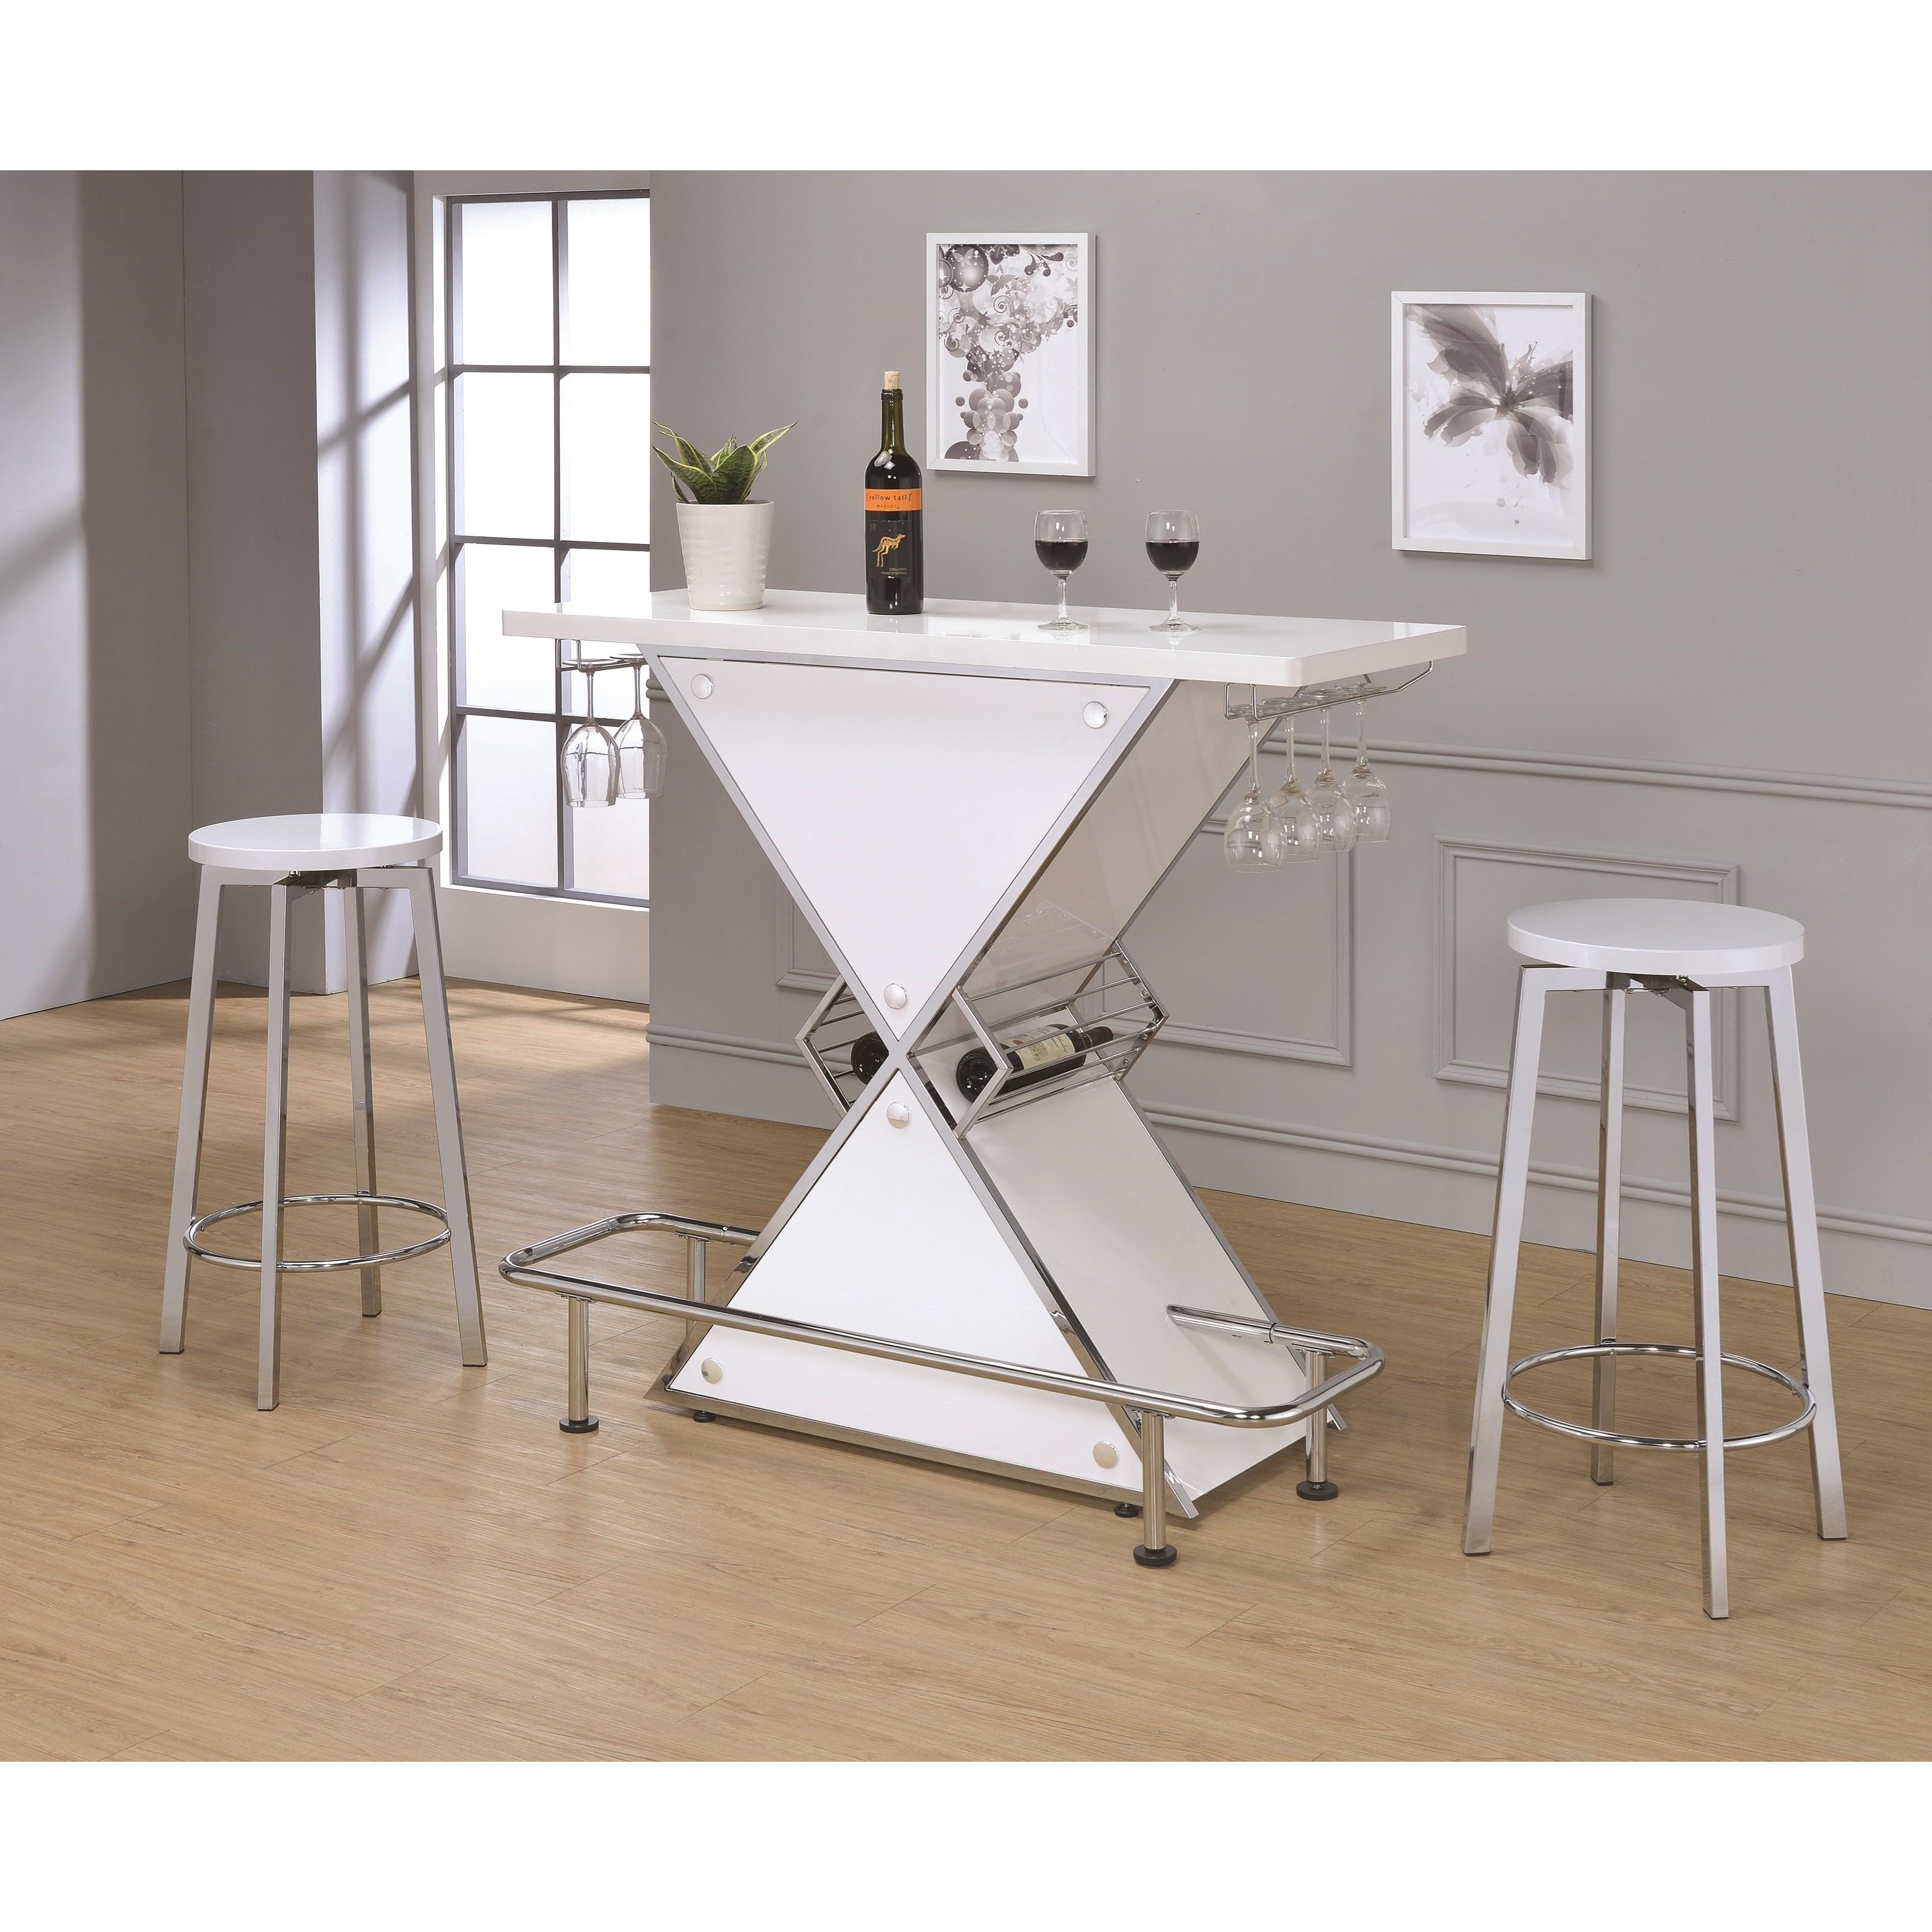 X Shaped Acrylic Bar Unit Table Wine Stemware Rack Glossy White